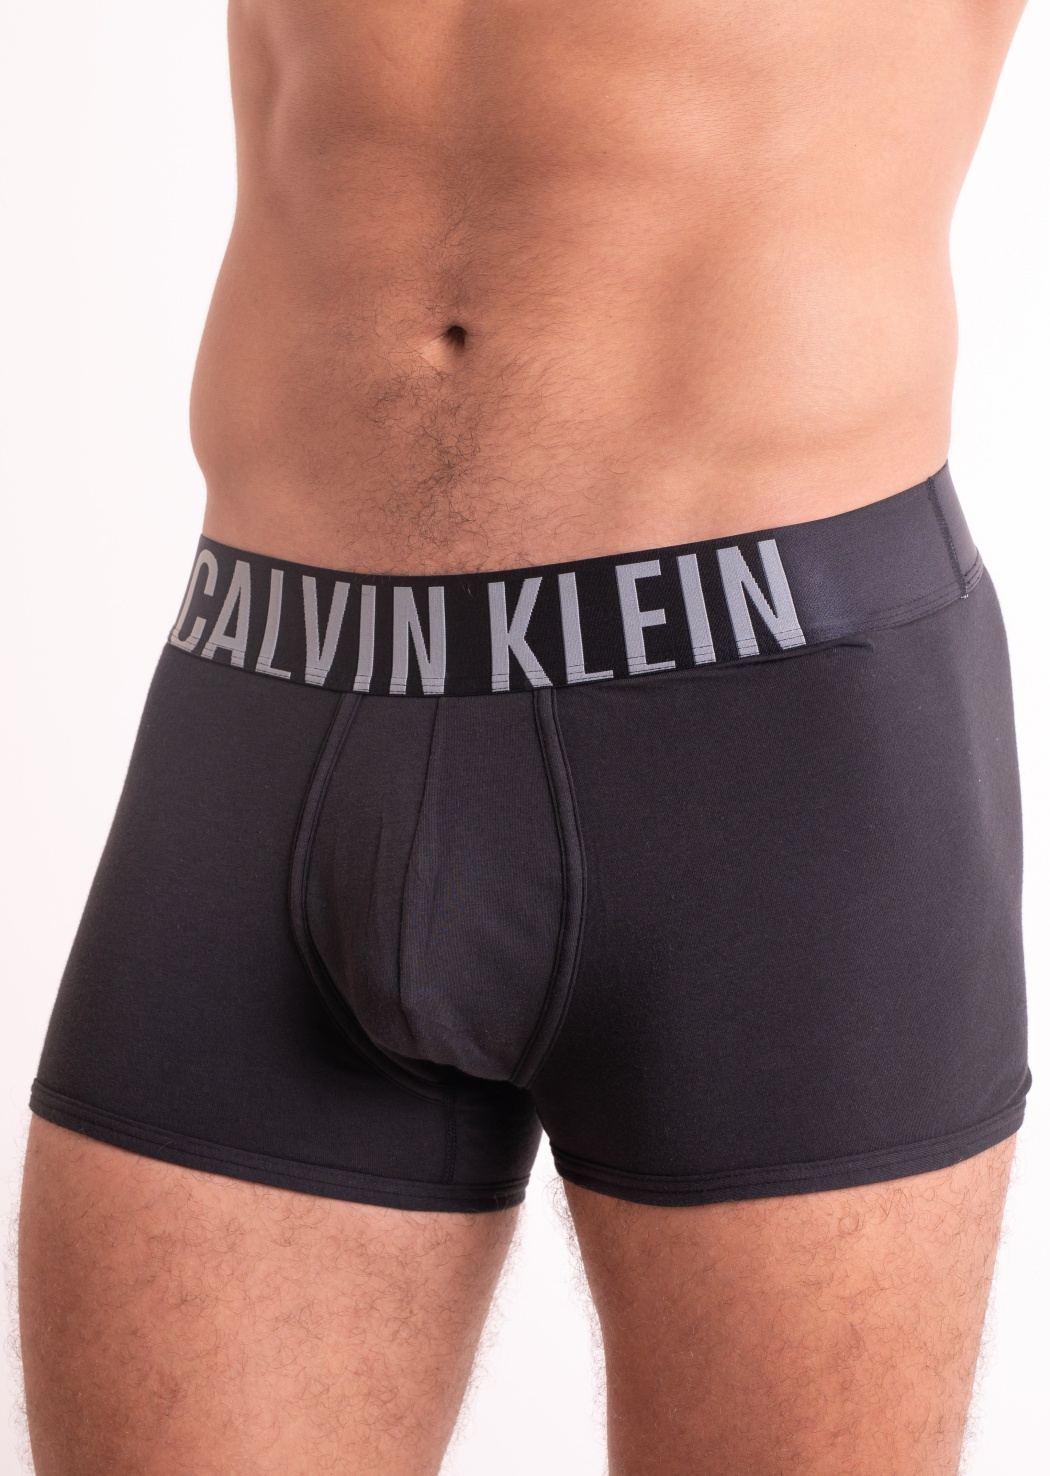 6dde6f4231 Pánske boxerky Calvin Klein NB1042